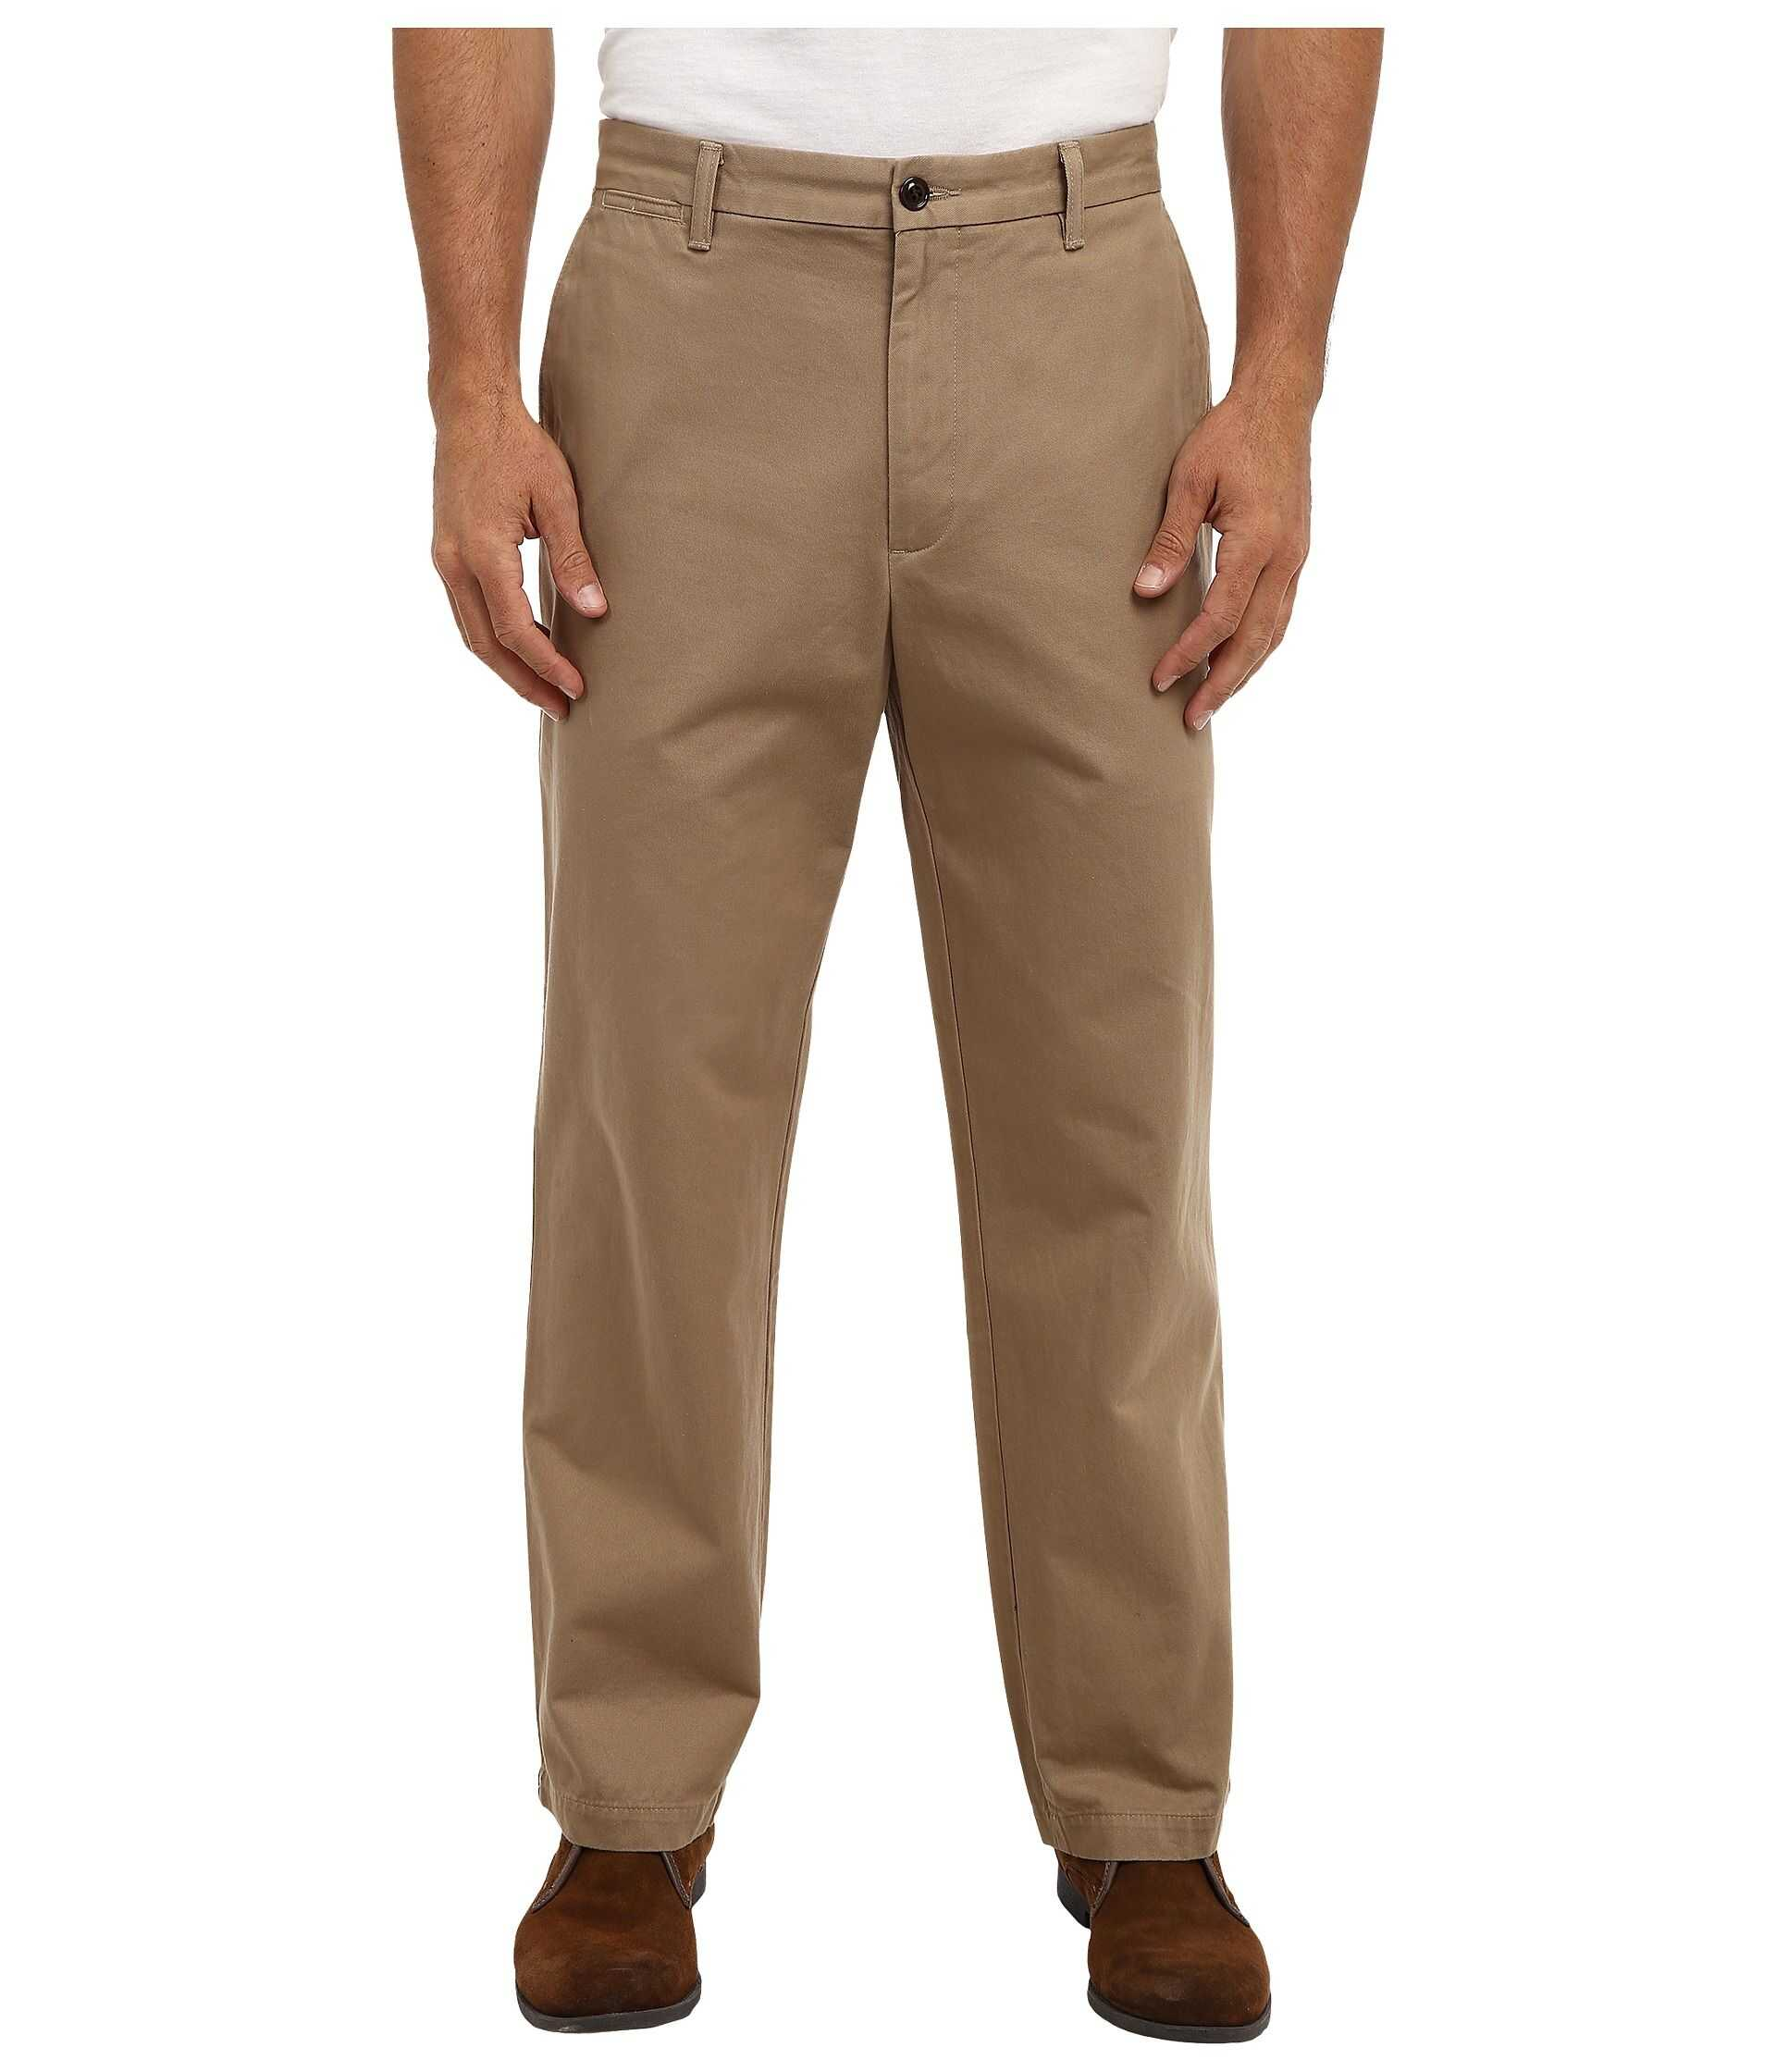 Dockers Mens Game Day Khaki D3 Classic Fit Flat Front Pant Cincinnati - New British Khaki